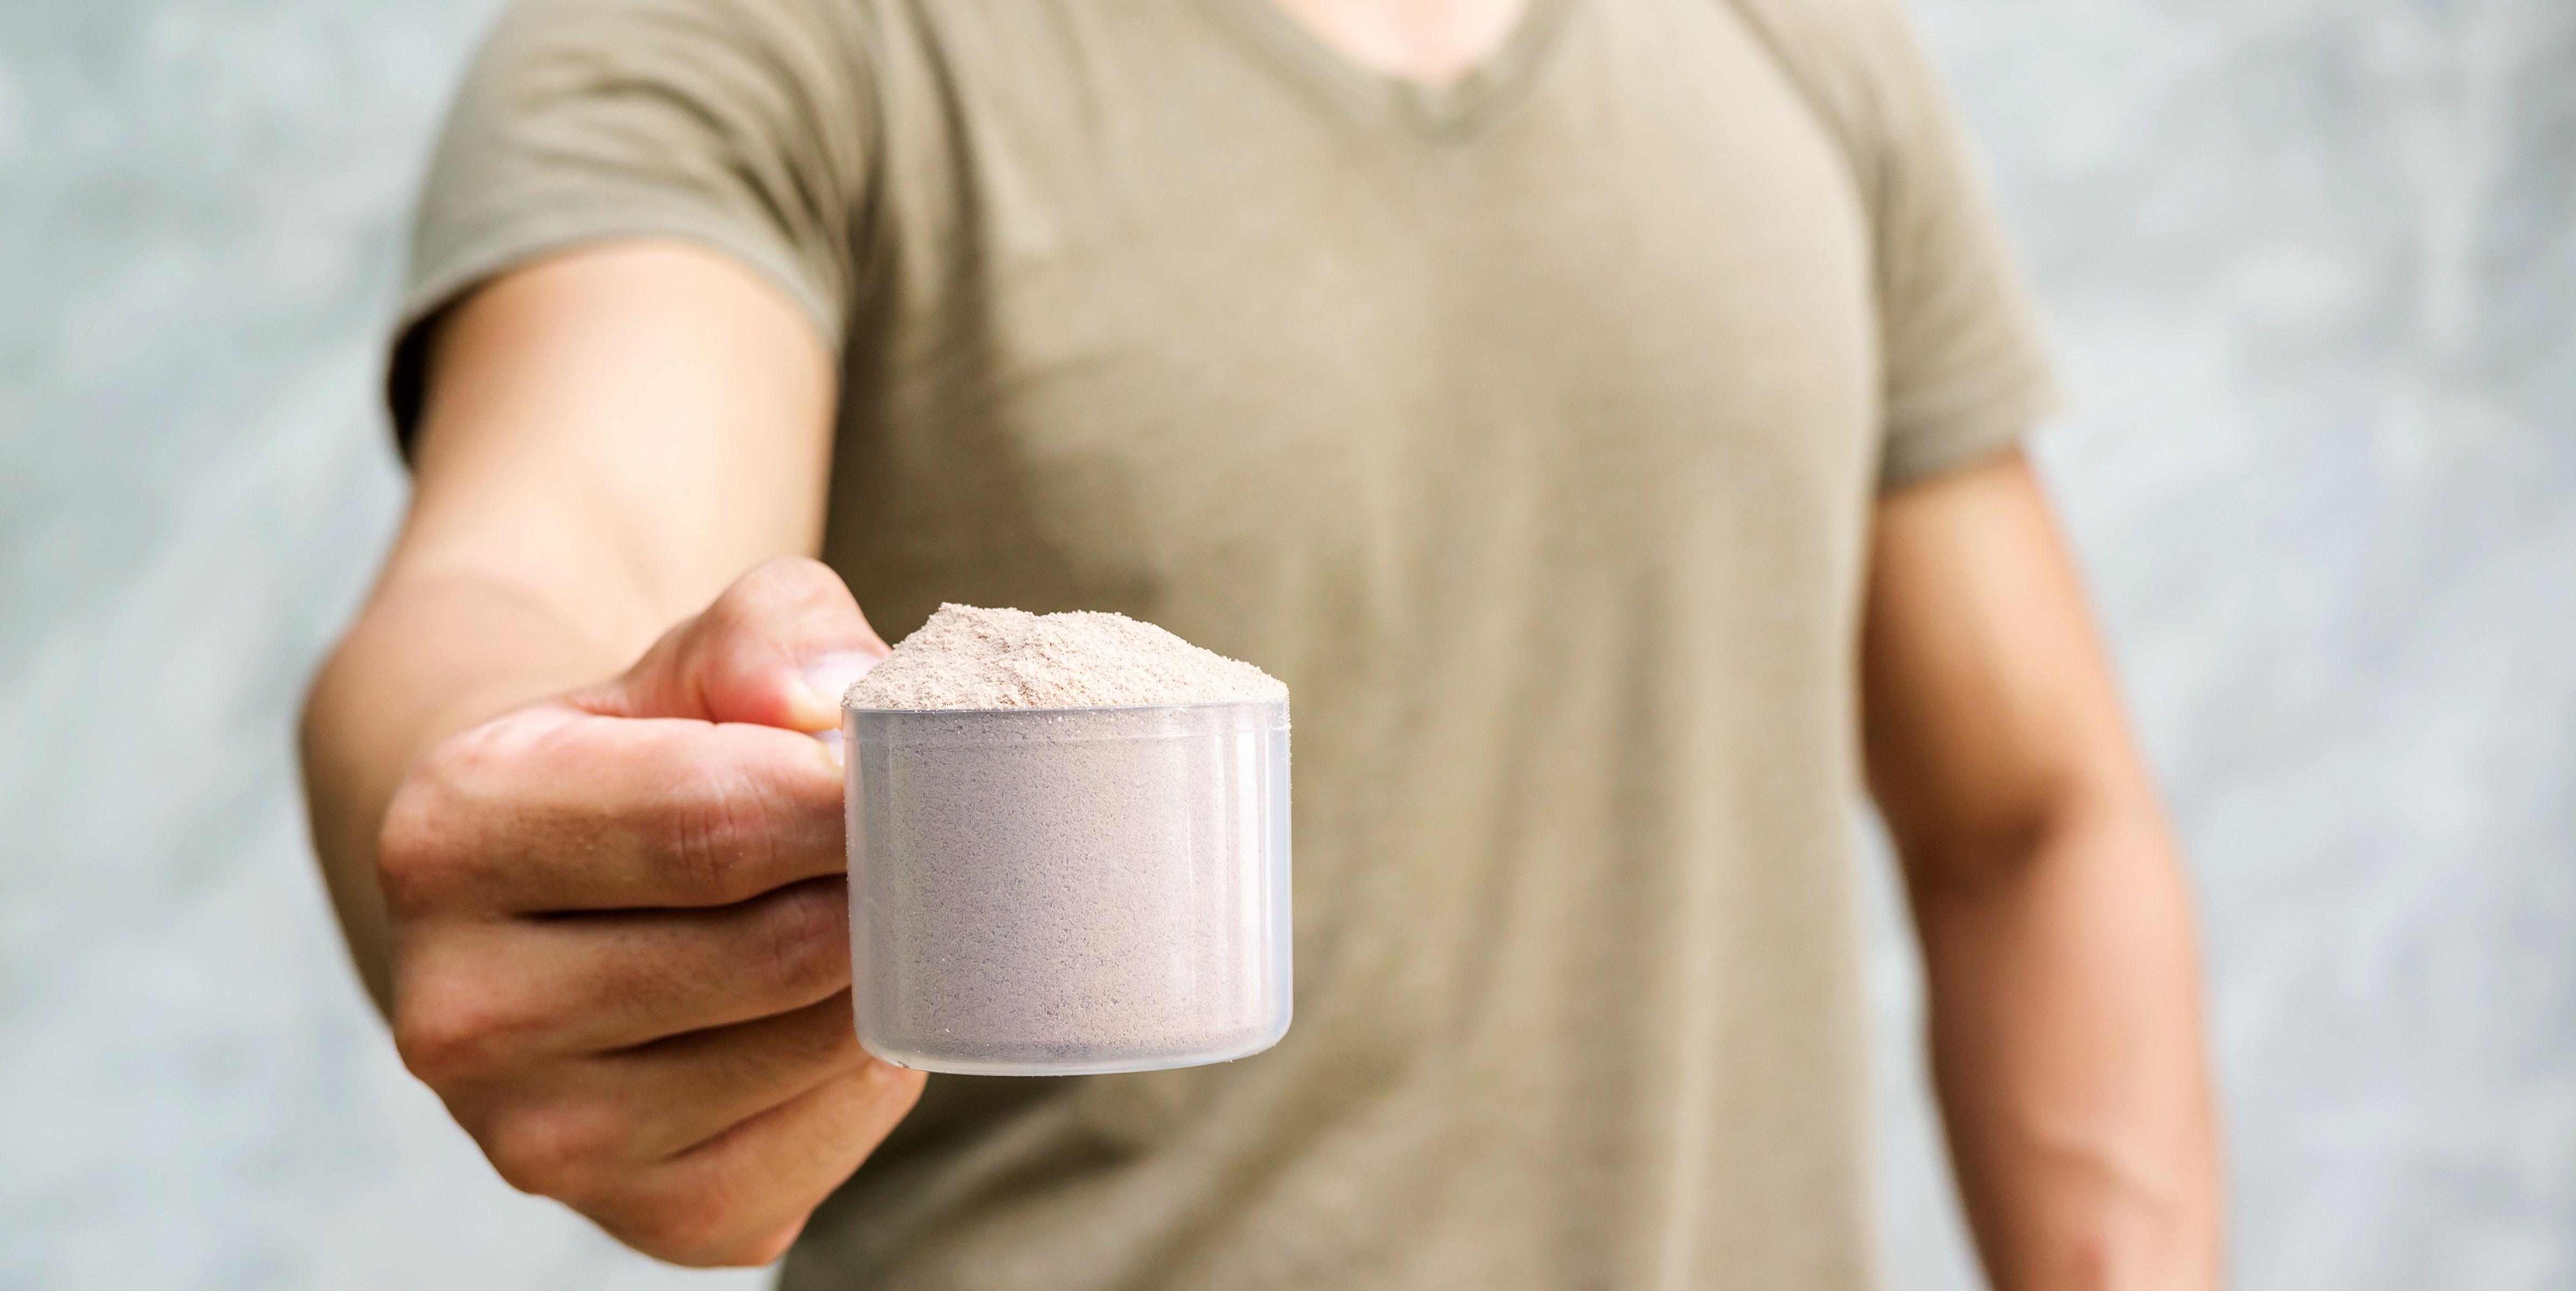 The 7 Best Keto-Friendly Protein Powders